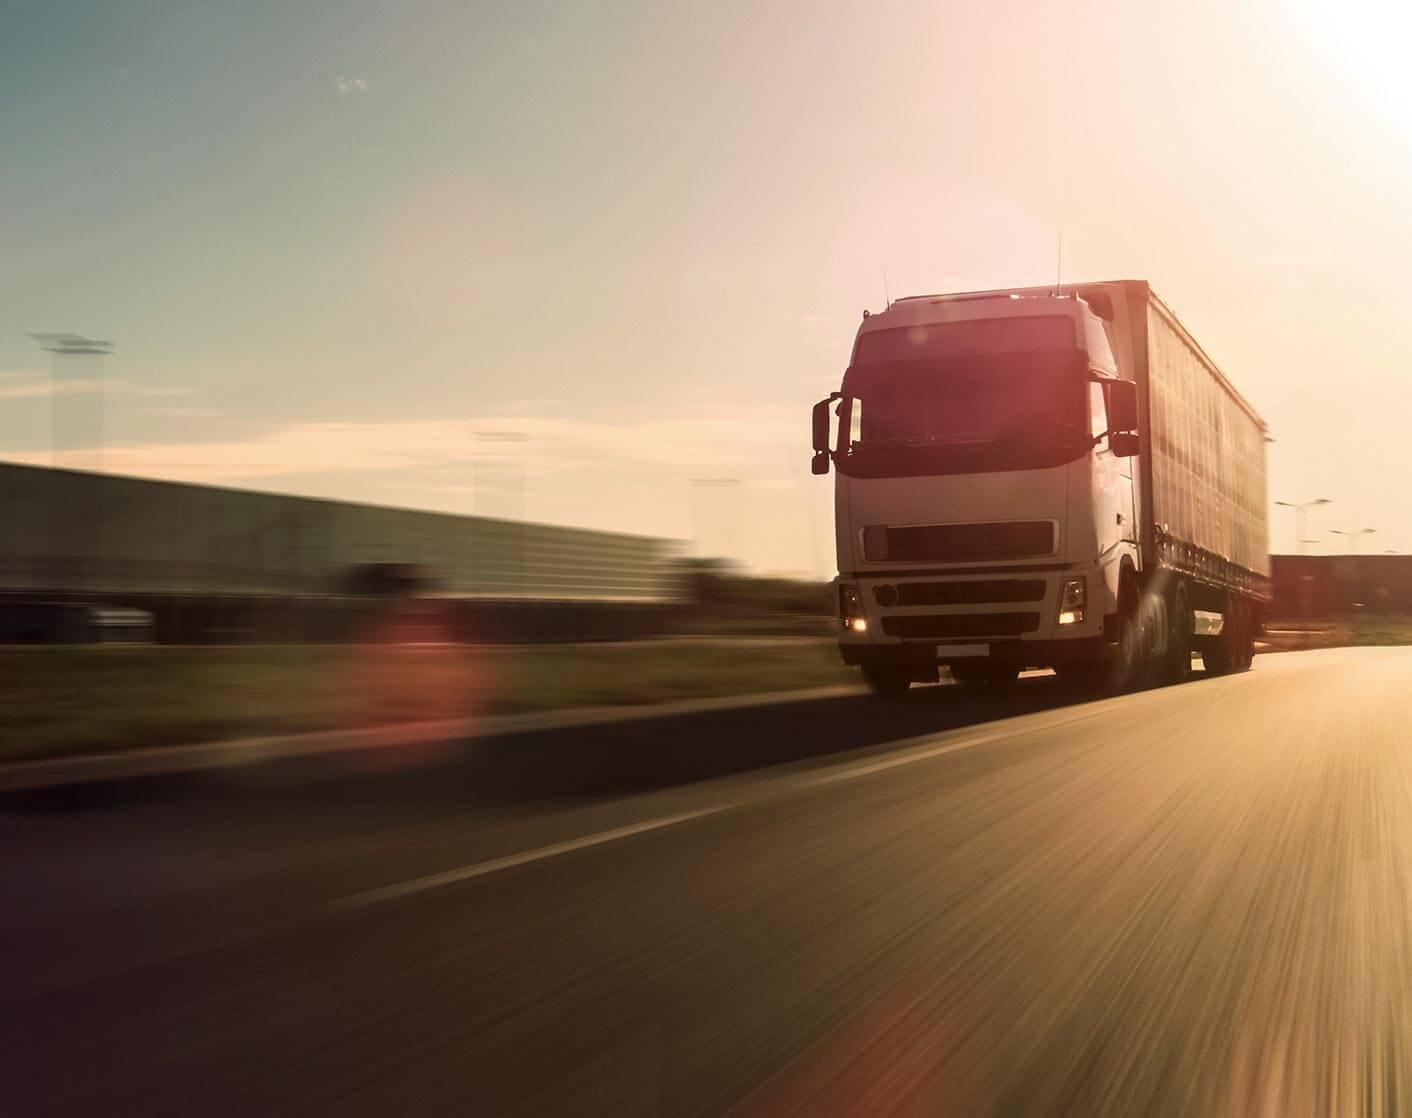 transport truck on road